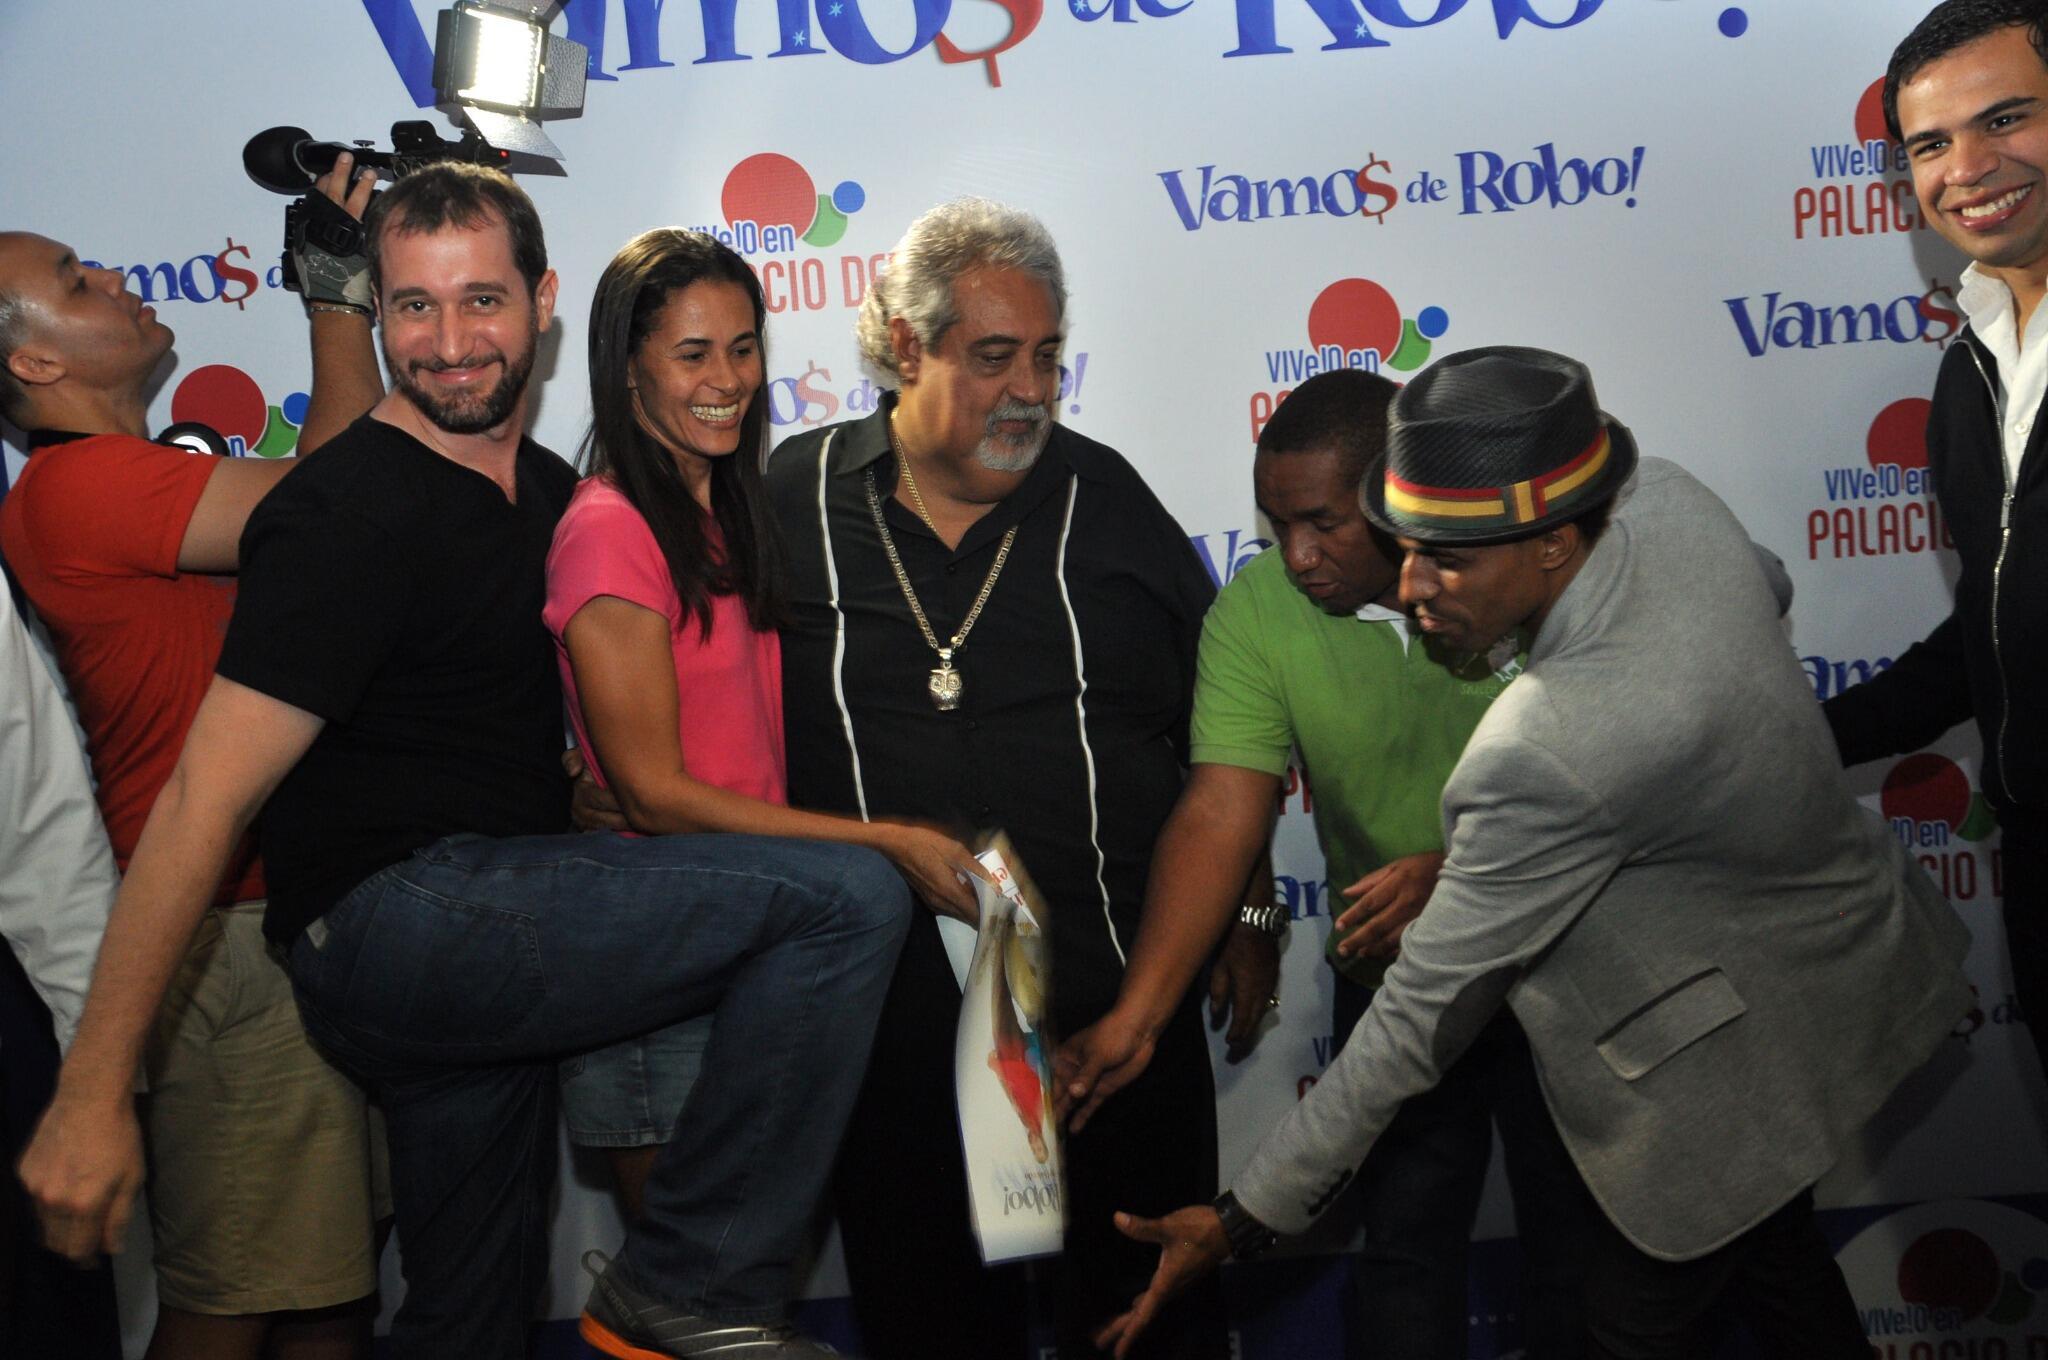 """@VamosdeRobo: Los actores de #VamosdeRobo se gozaron el encuentro en @tusambildo gracias @PalaciodelCine  con fans http://t.co/6CdbNktgDV"""